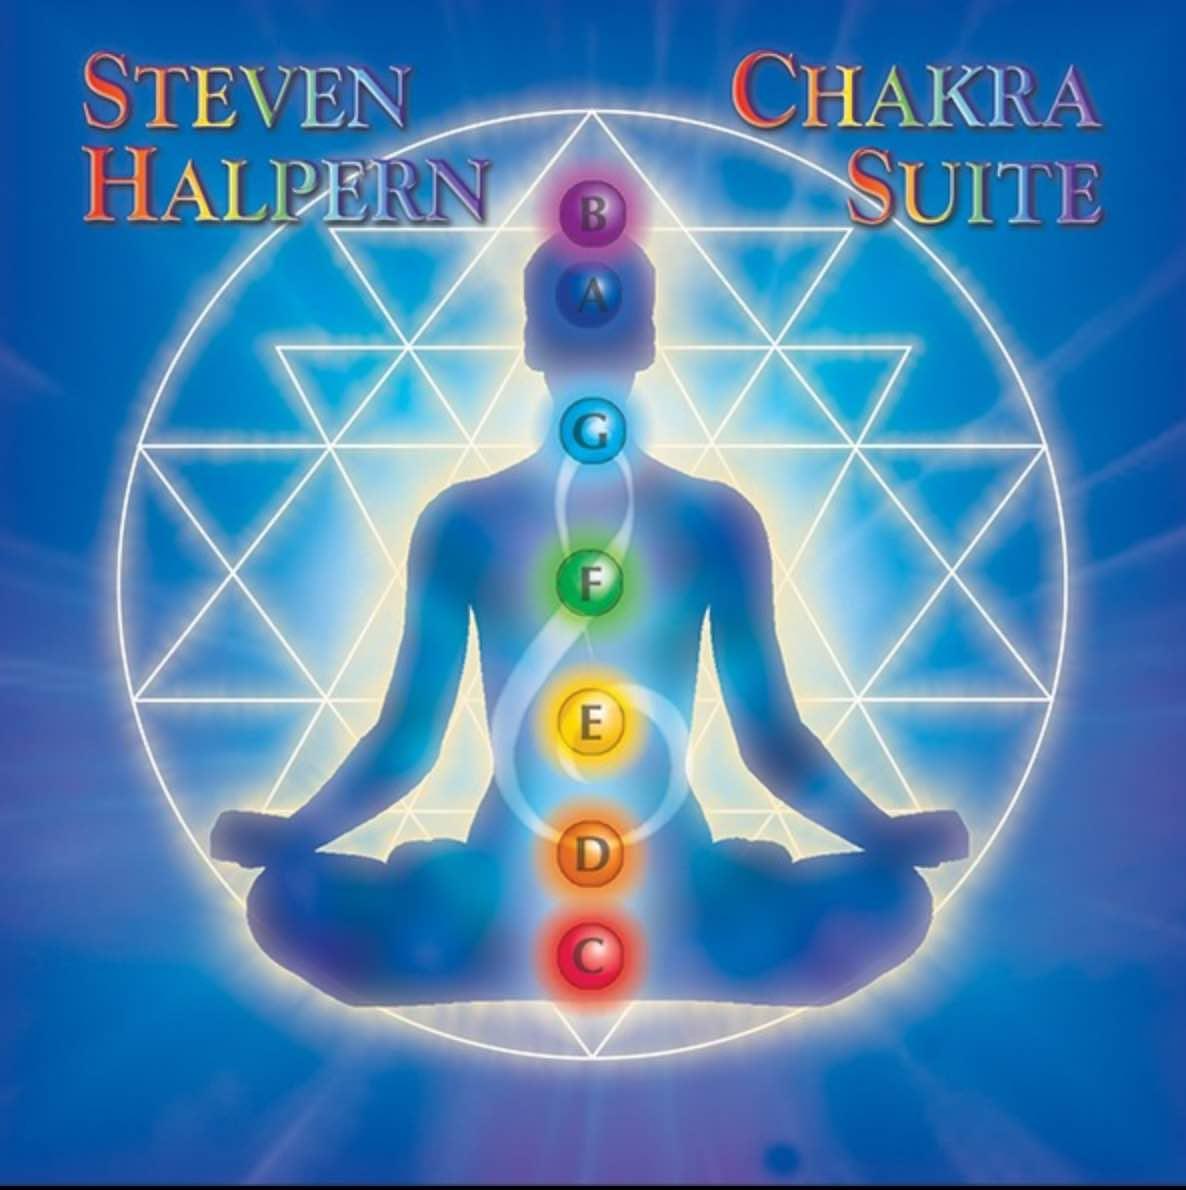 Chakra Suite Halpern